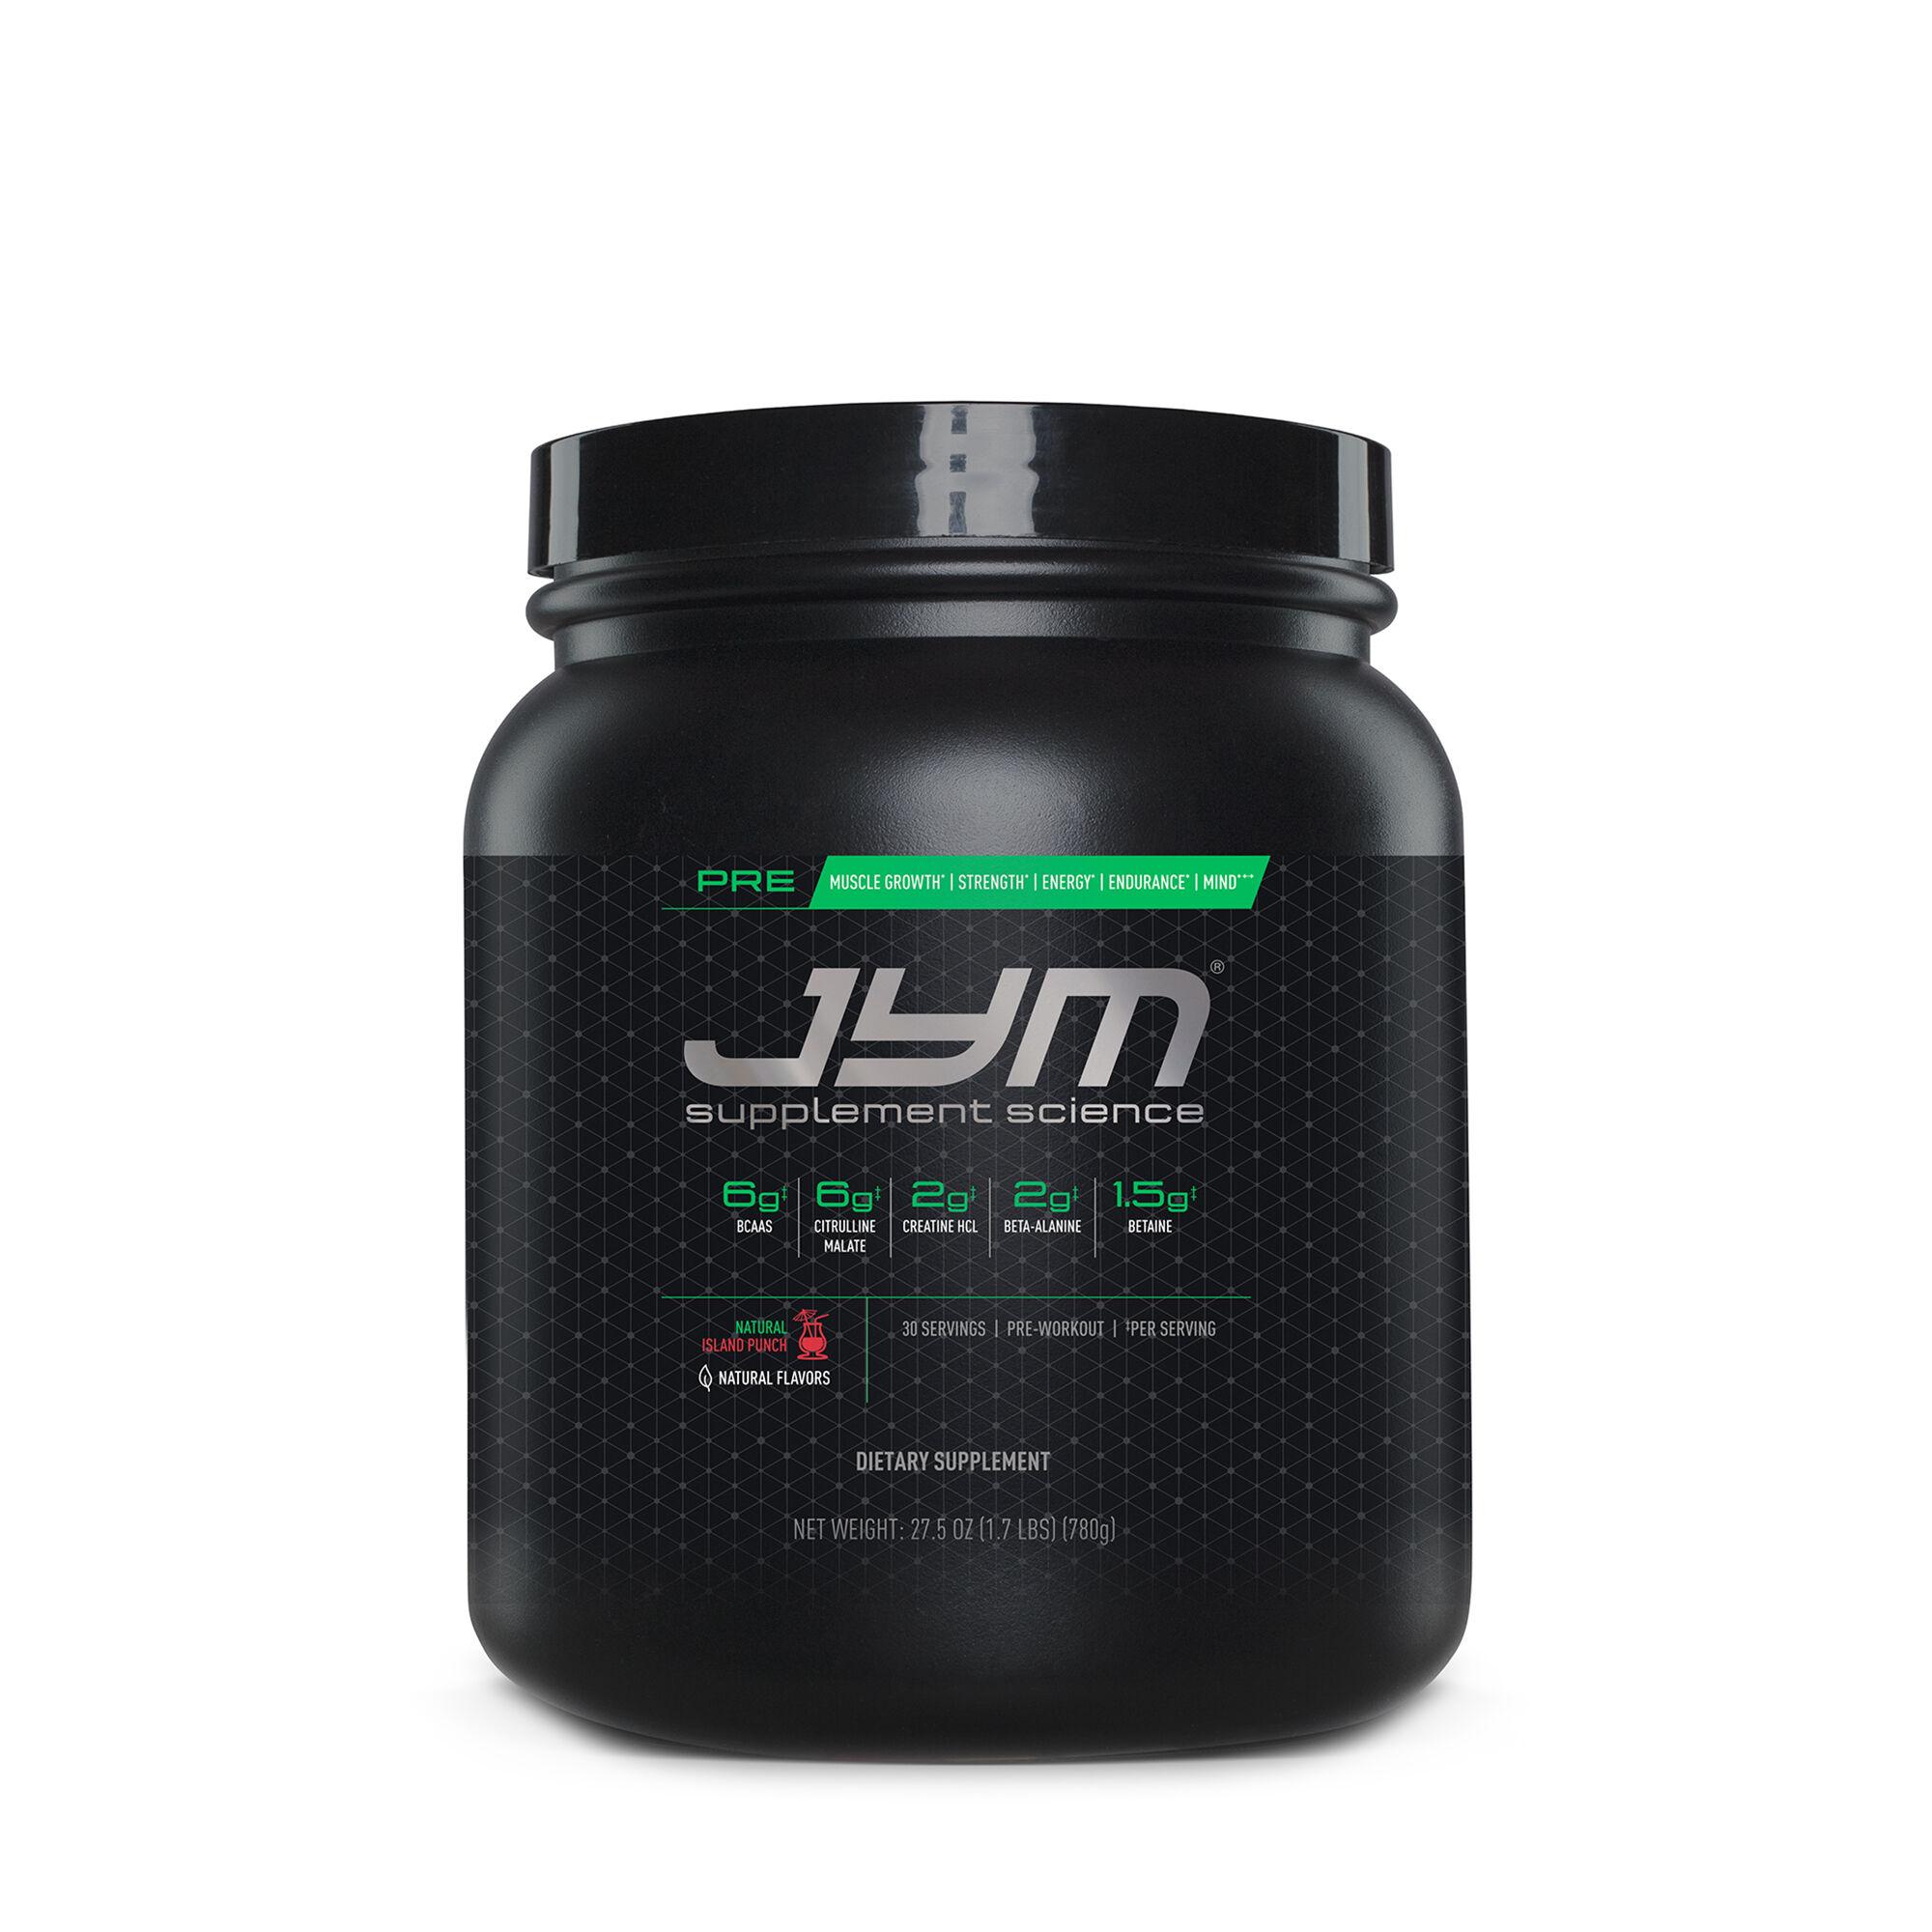 Gunpowder workout supplement